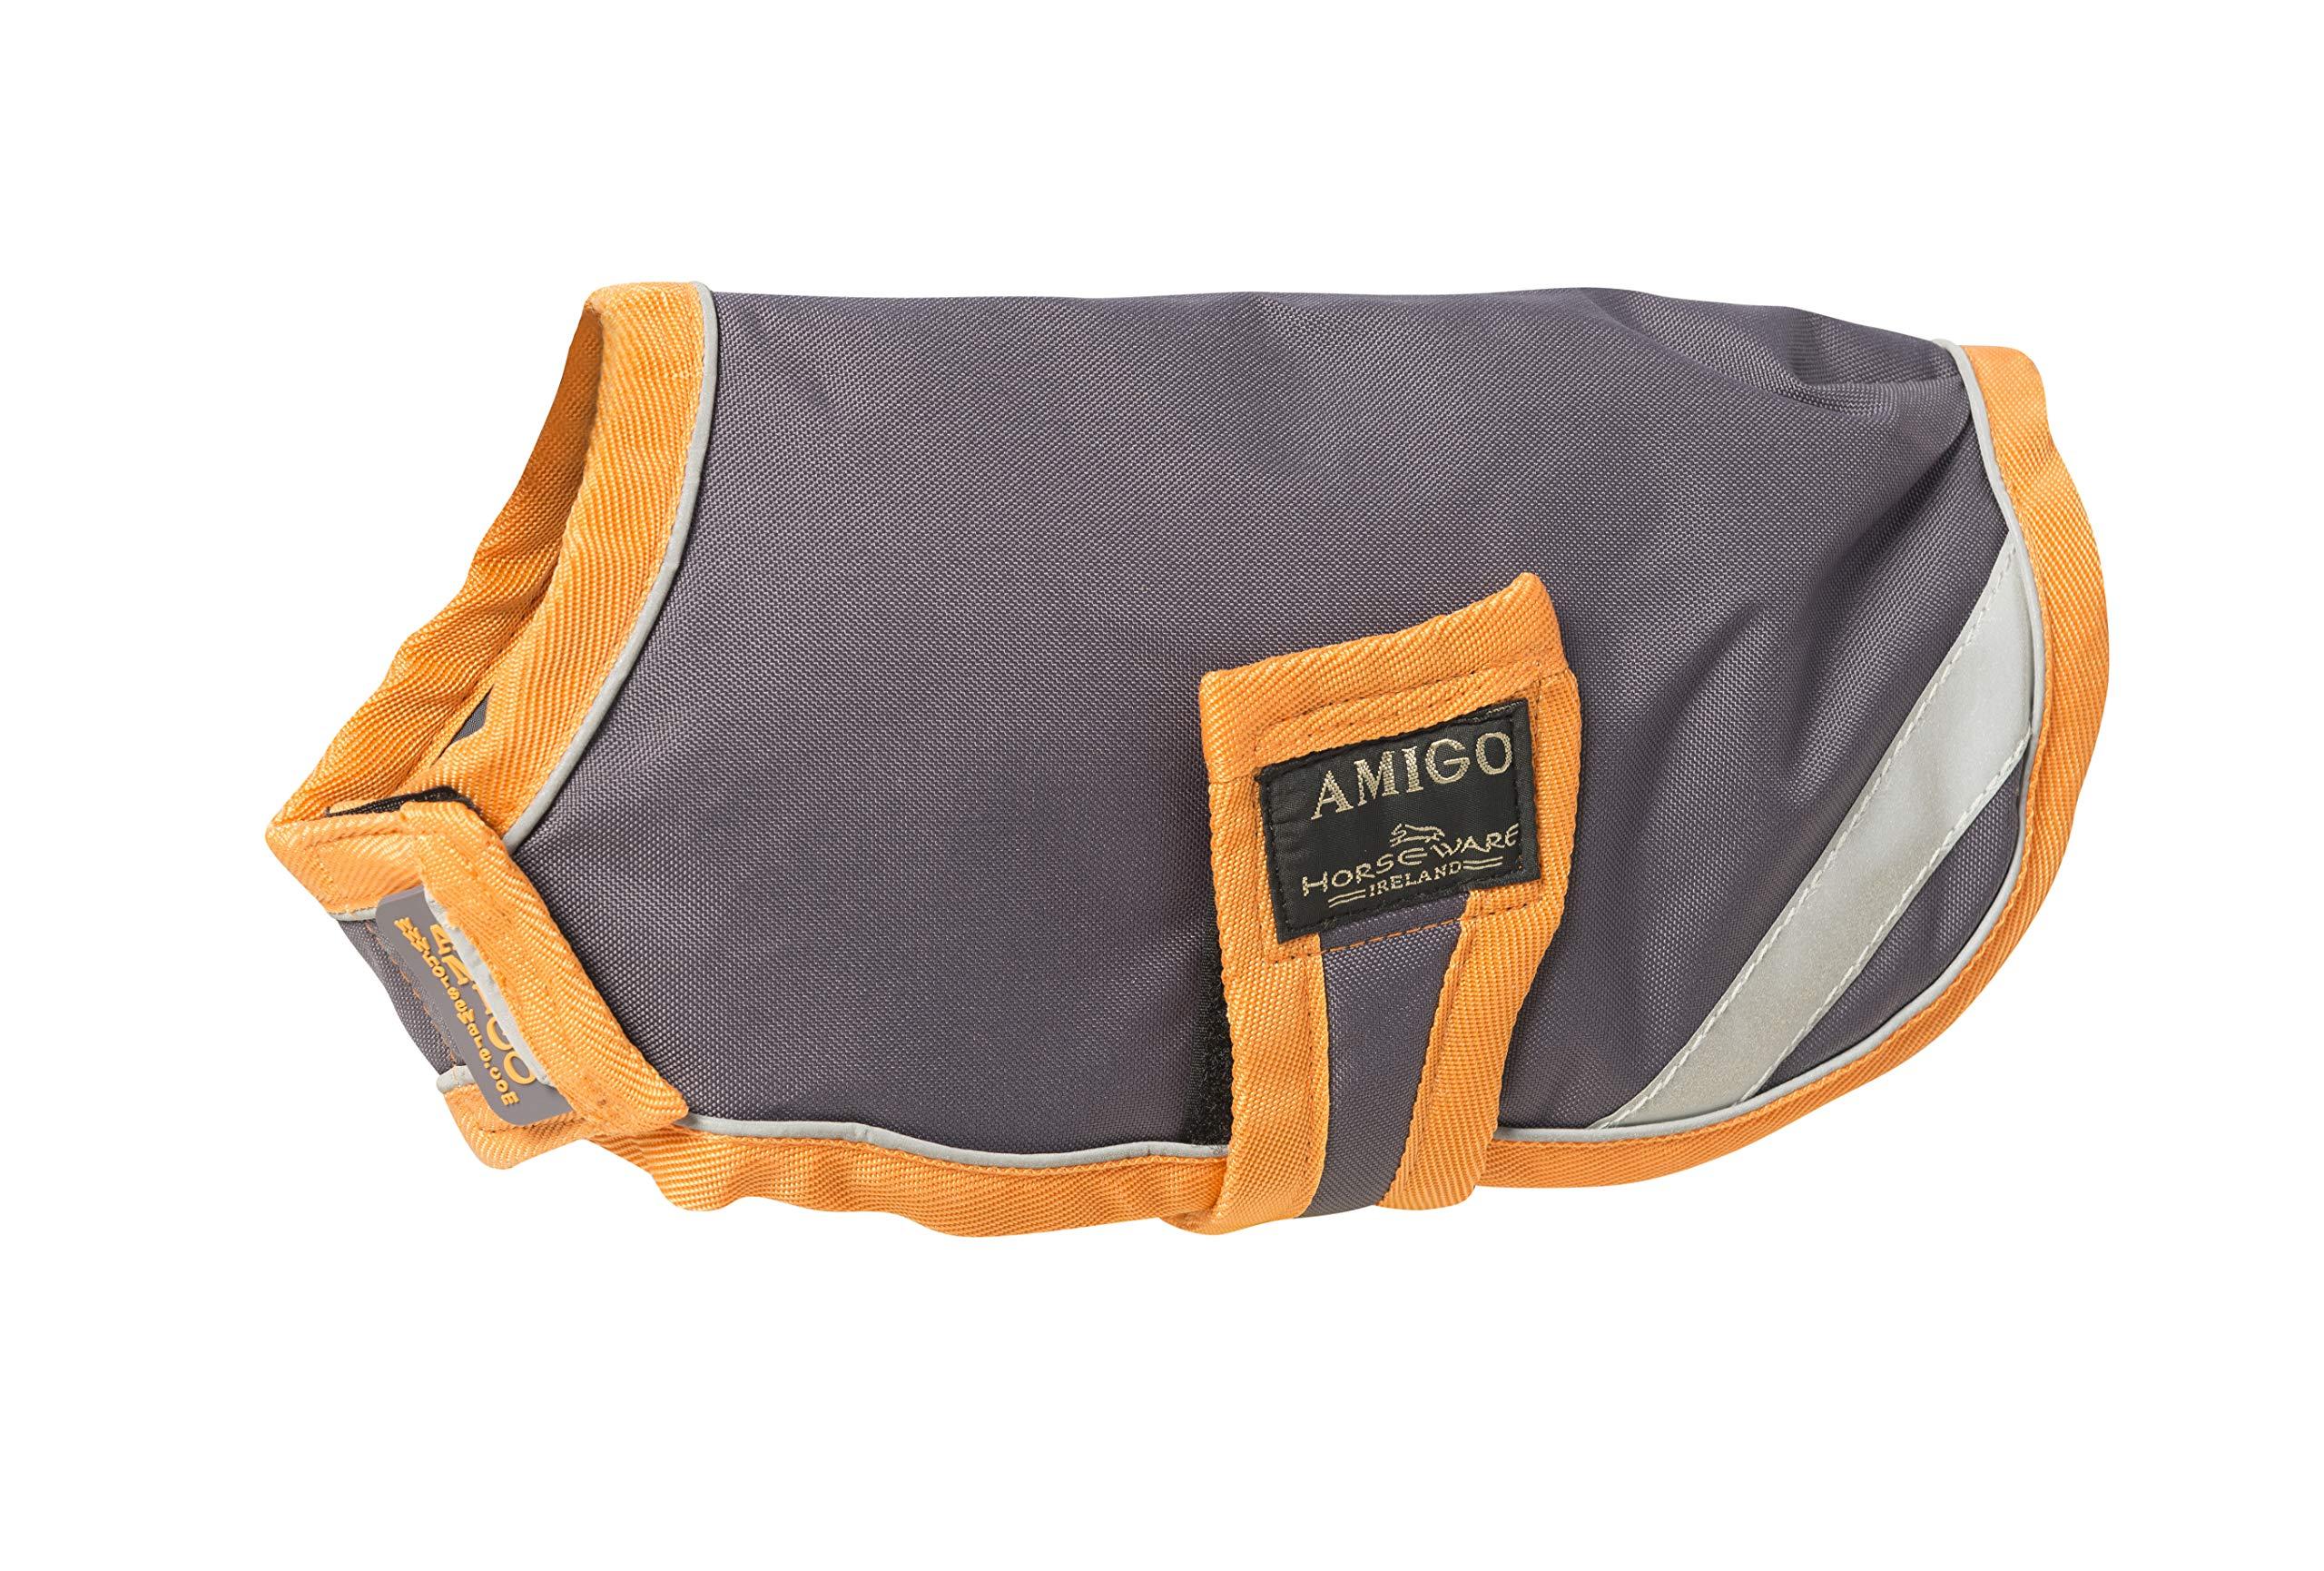 Amigo Dog Blanket 100g Medium Excalibur/Orange